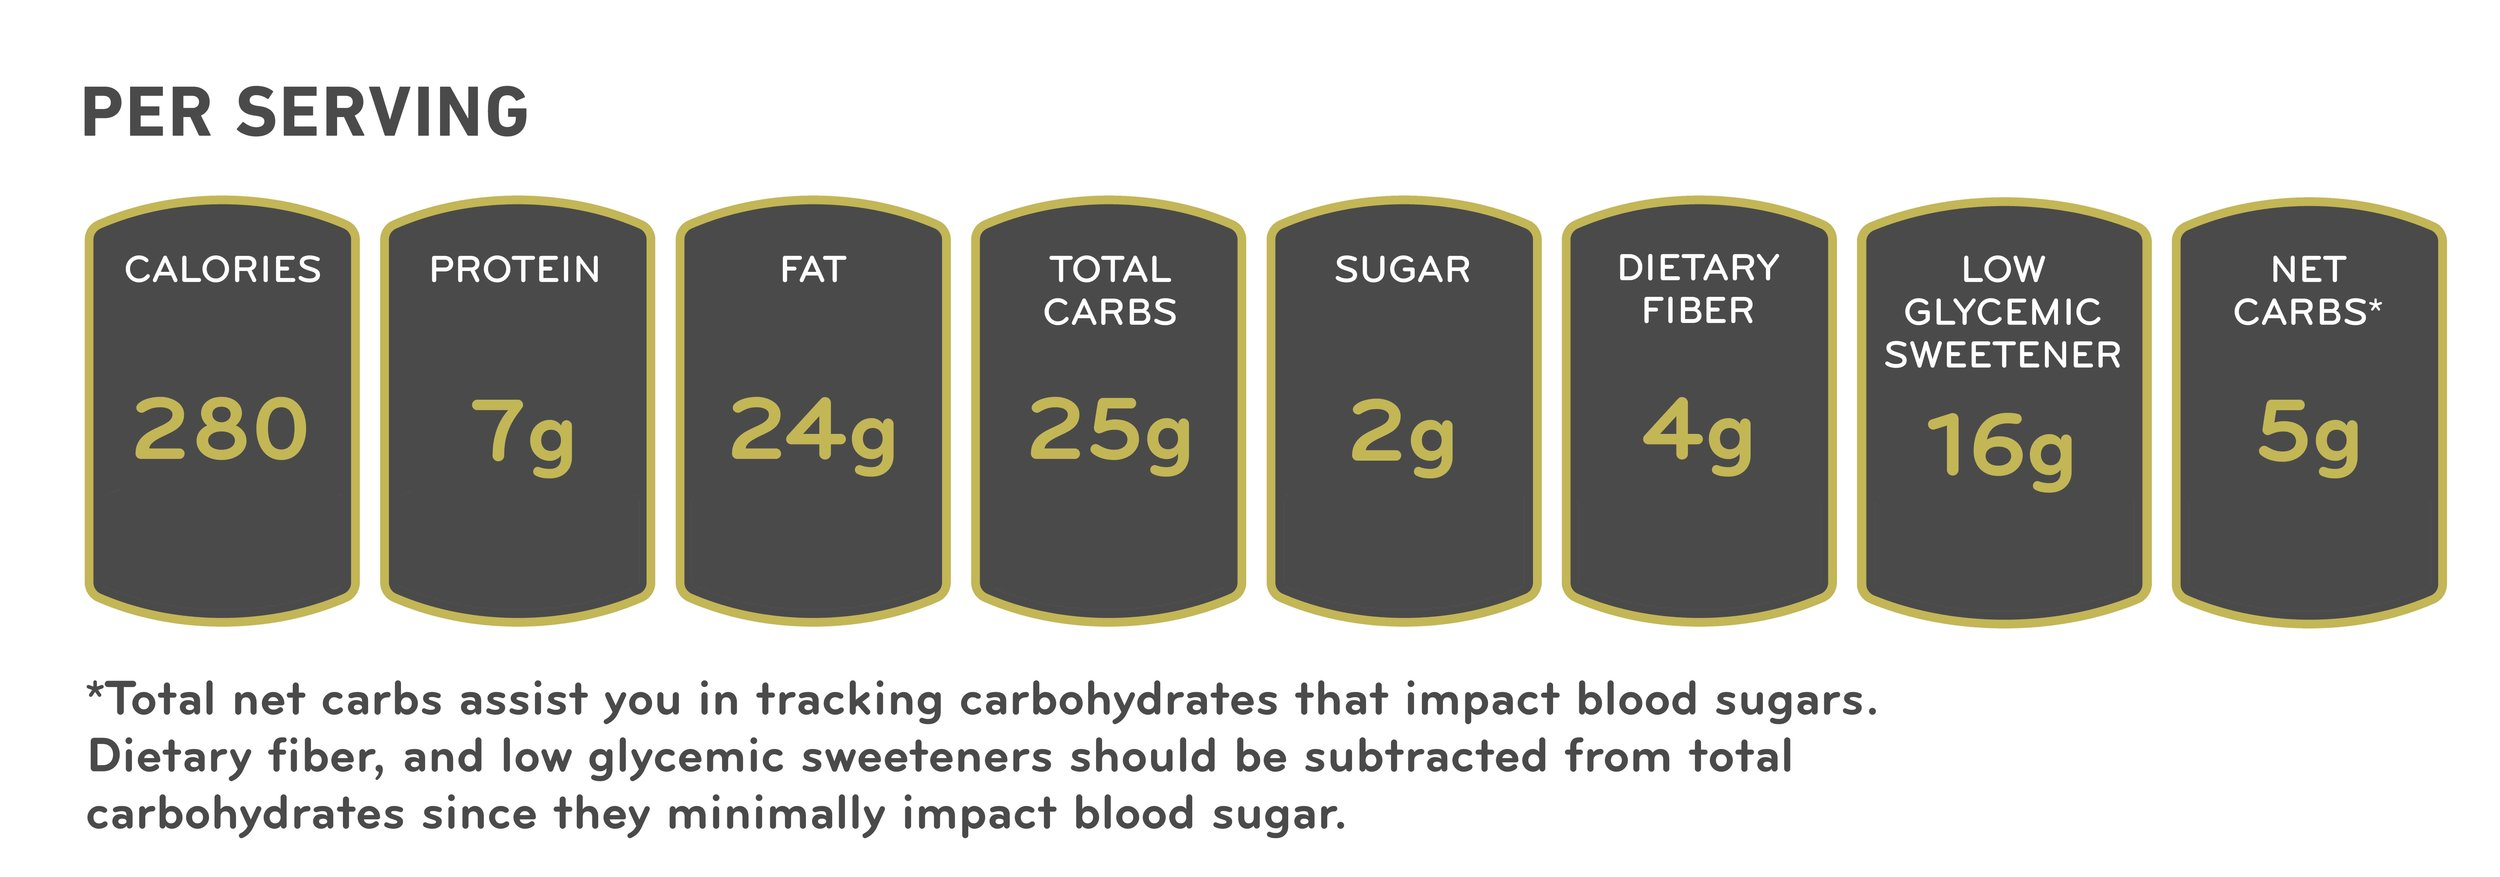 LOW CARB KETO HEALTHY HALLOWEEN PUMPKIN CHEESECAKE BAR RECIPE NUTRITION FACTS.jpg